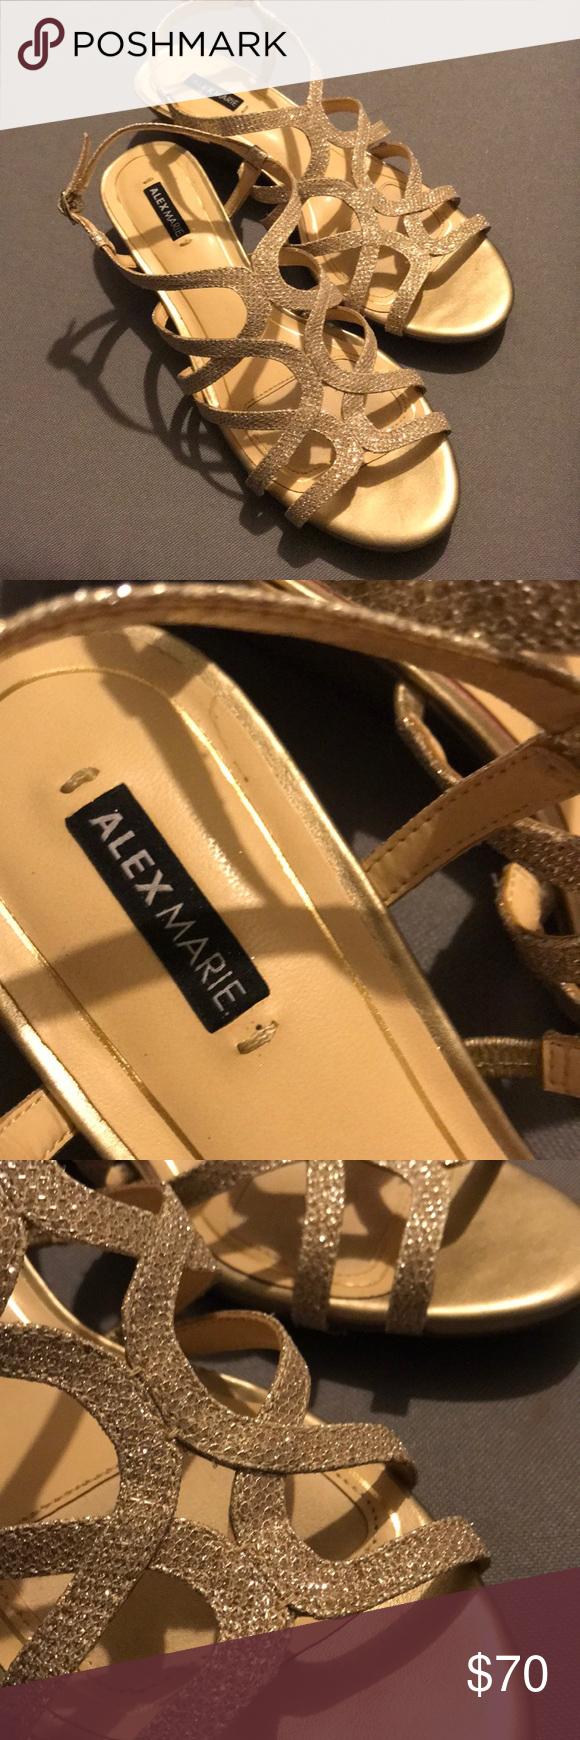 5a9c1e65524 ALEX MARIE WEDGE SHOES Brand new Never worn! Size 8.5M Alex Marie ...